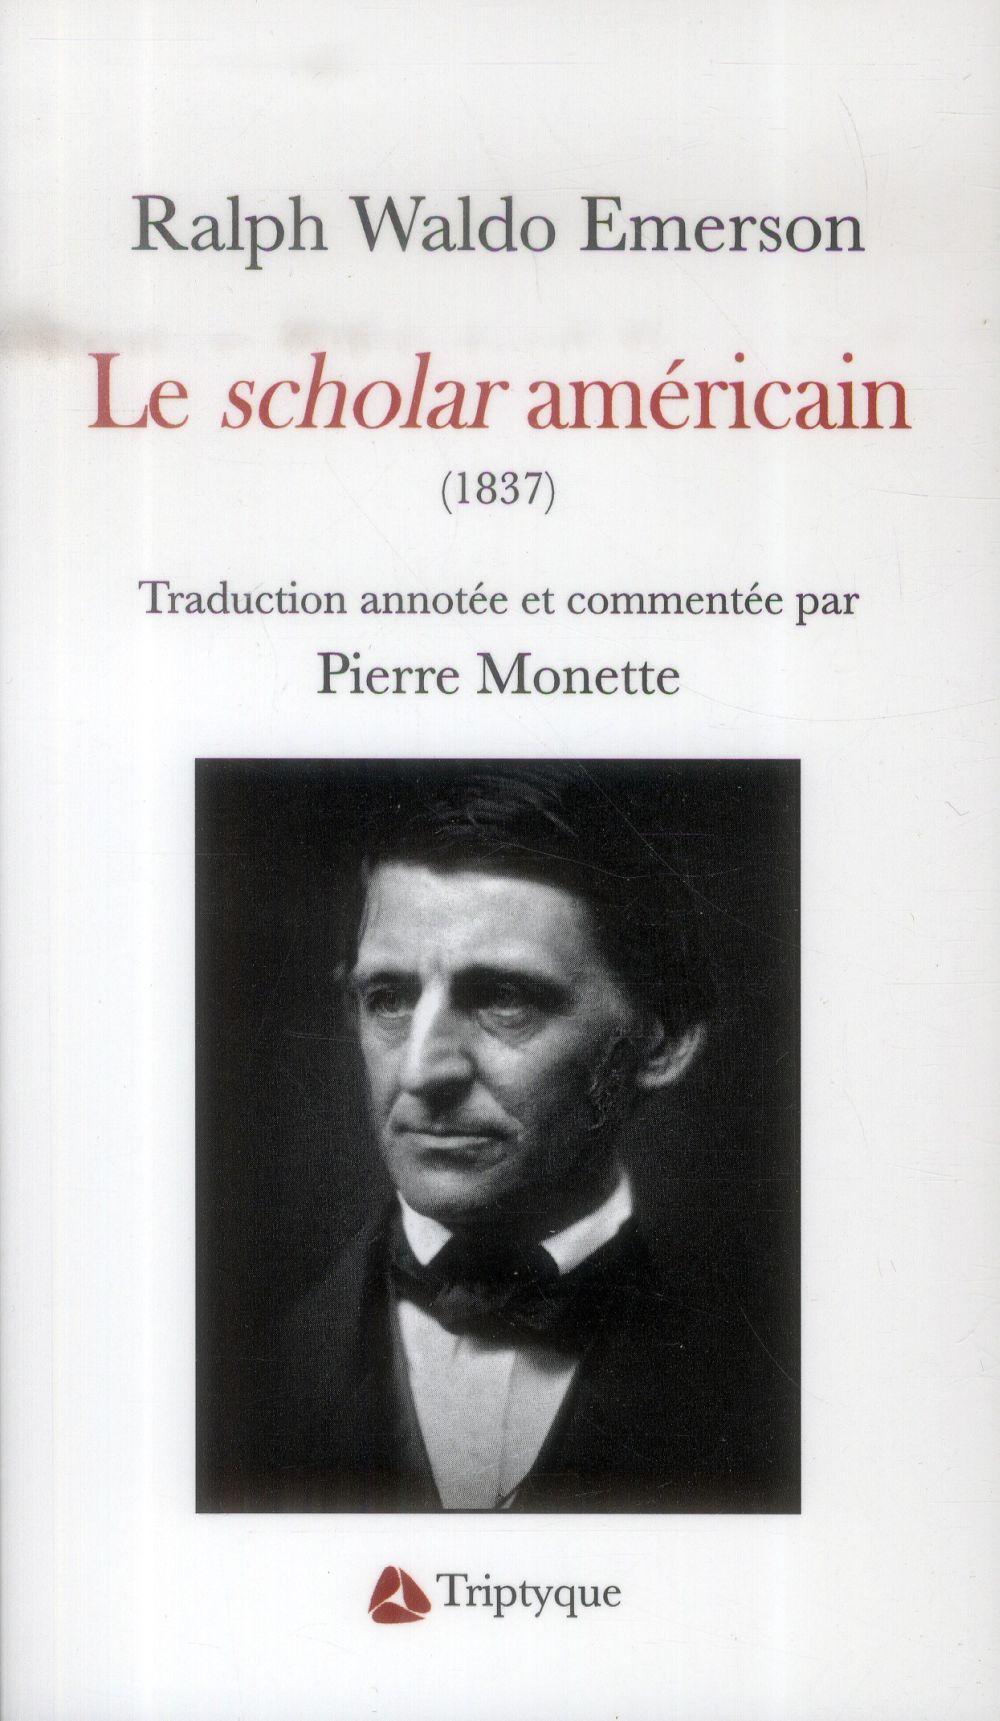 Le scholar américain (1837)